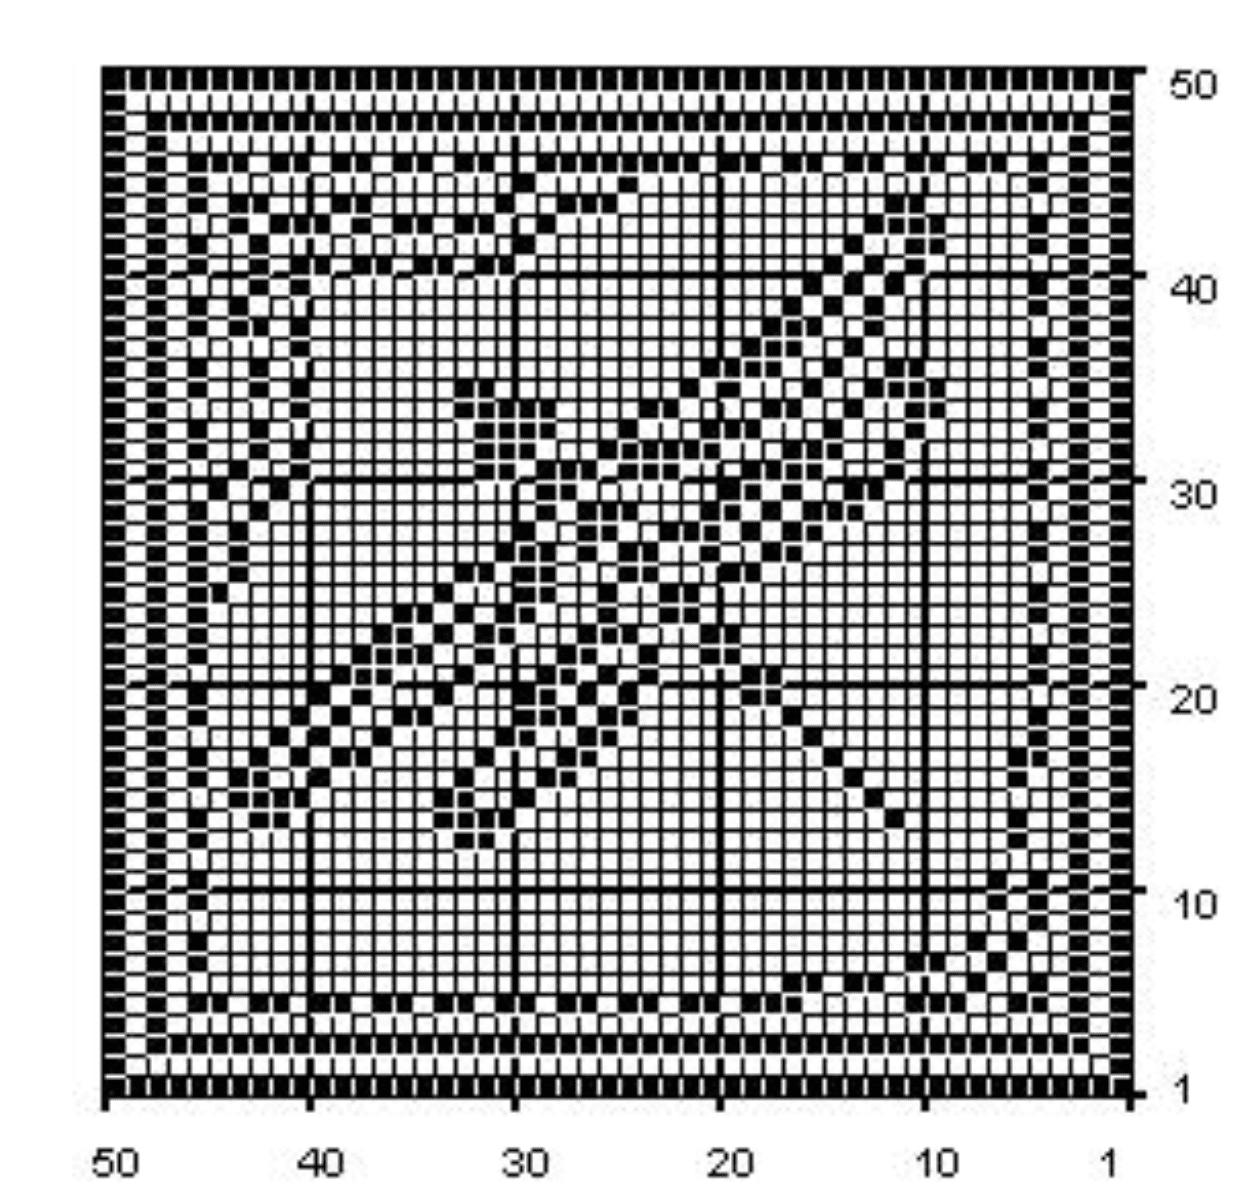 Dragonfly Filet Crochet Chart Free Pattern